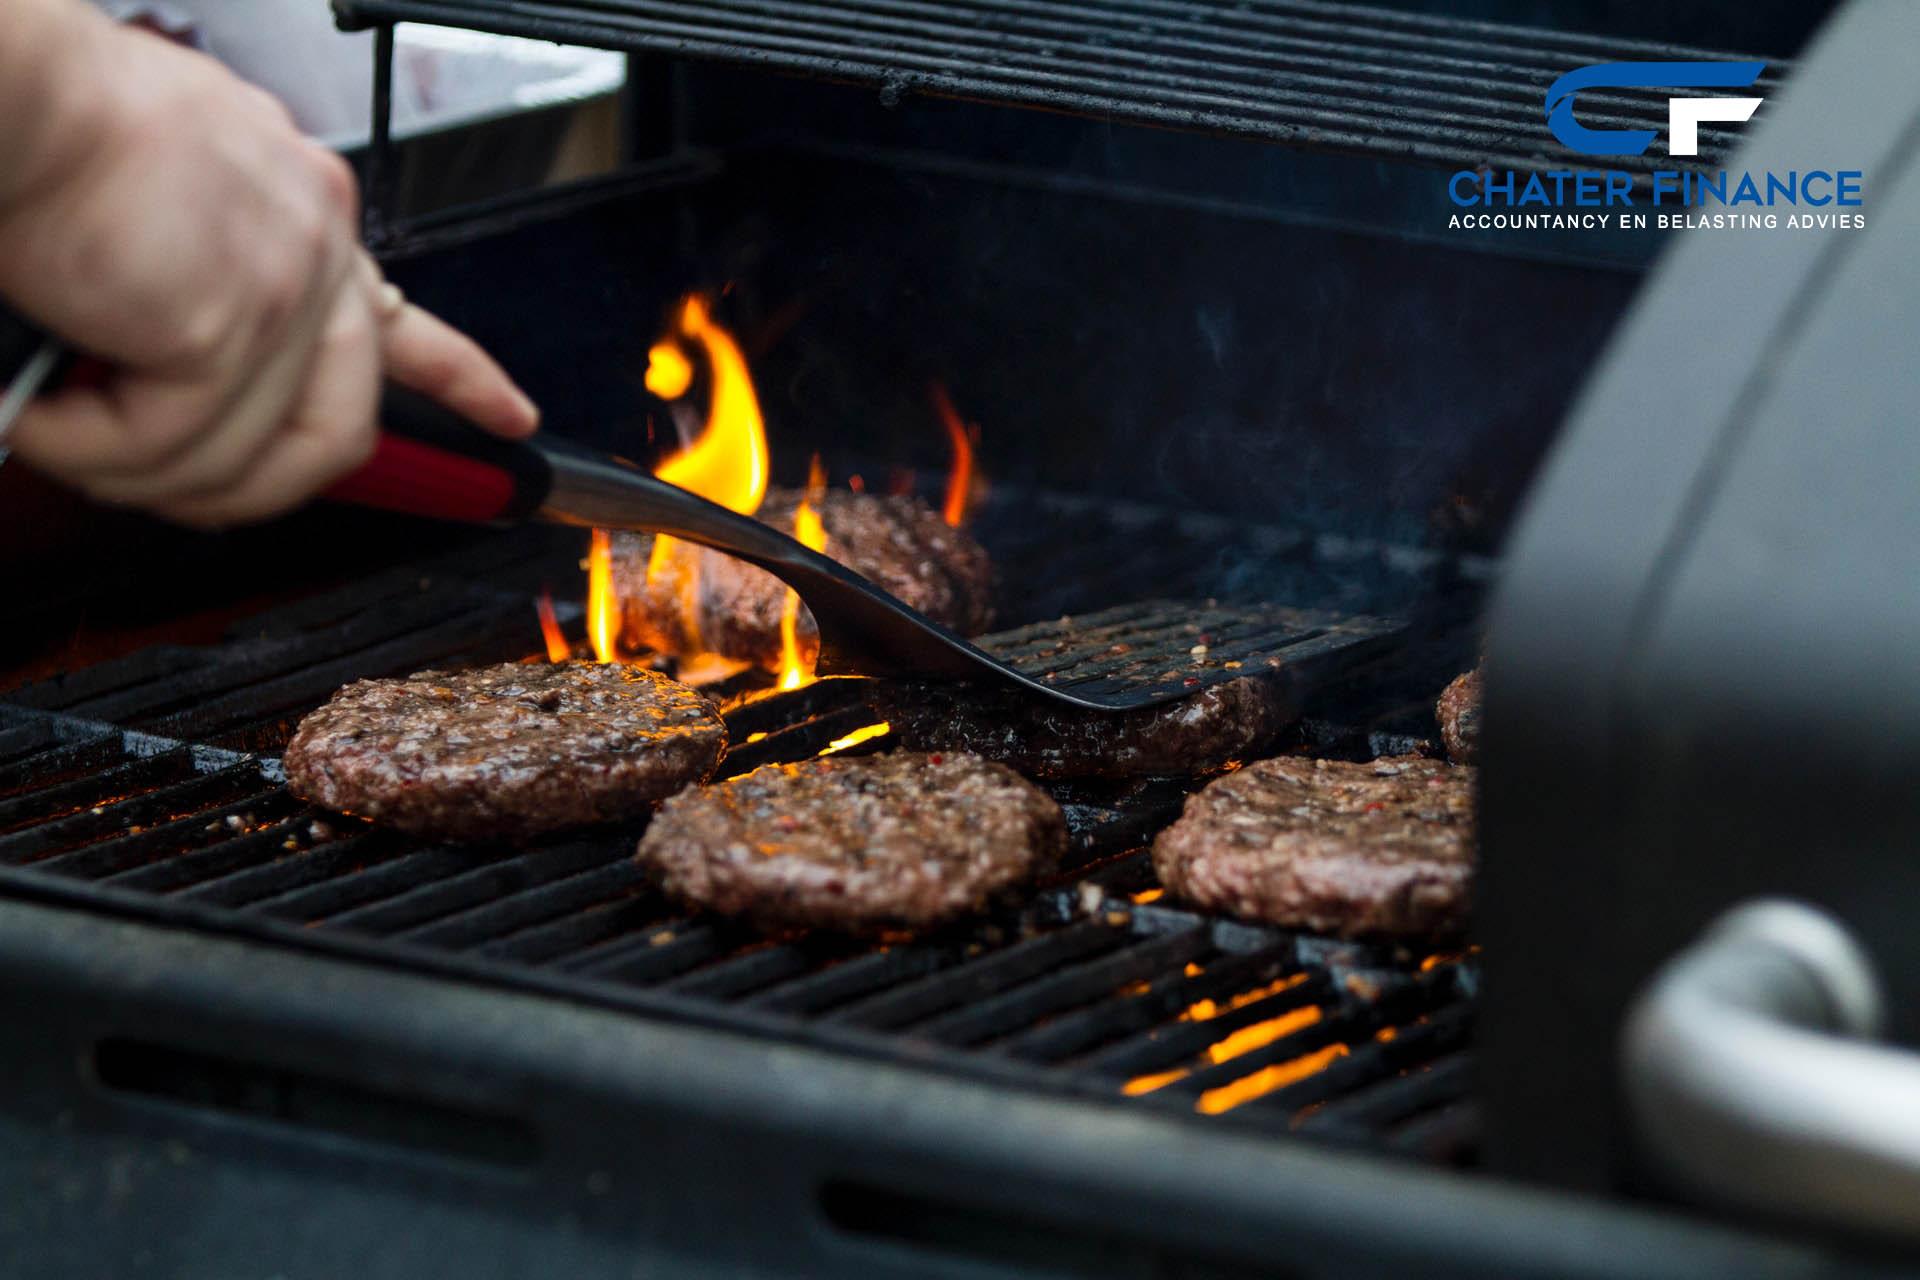 Werkkostenregeling en de zomerbarbecue